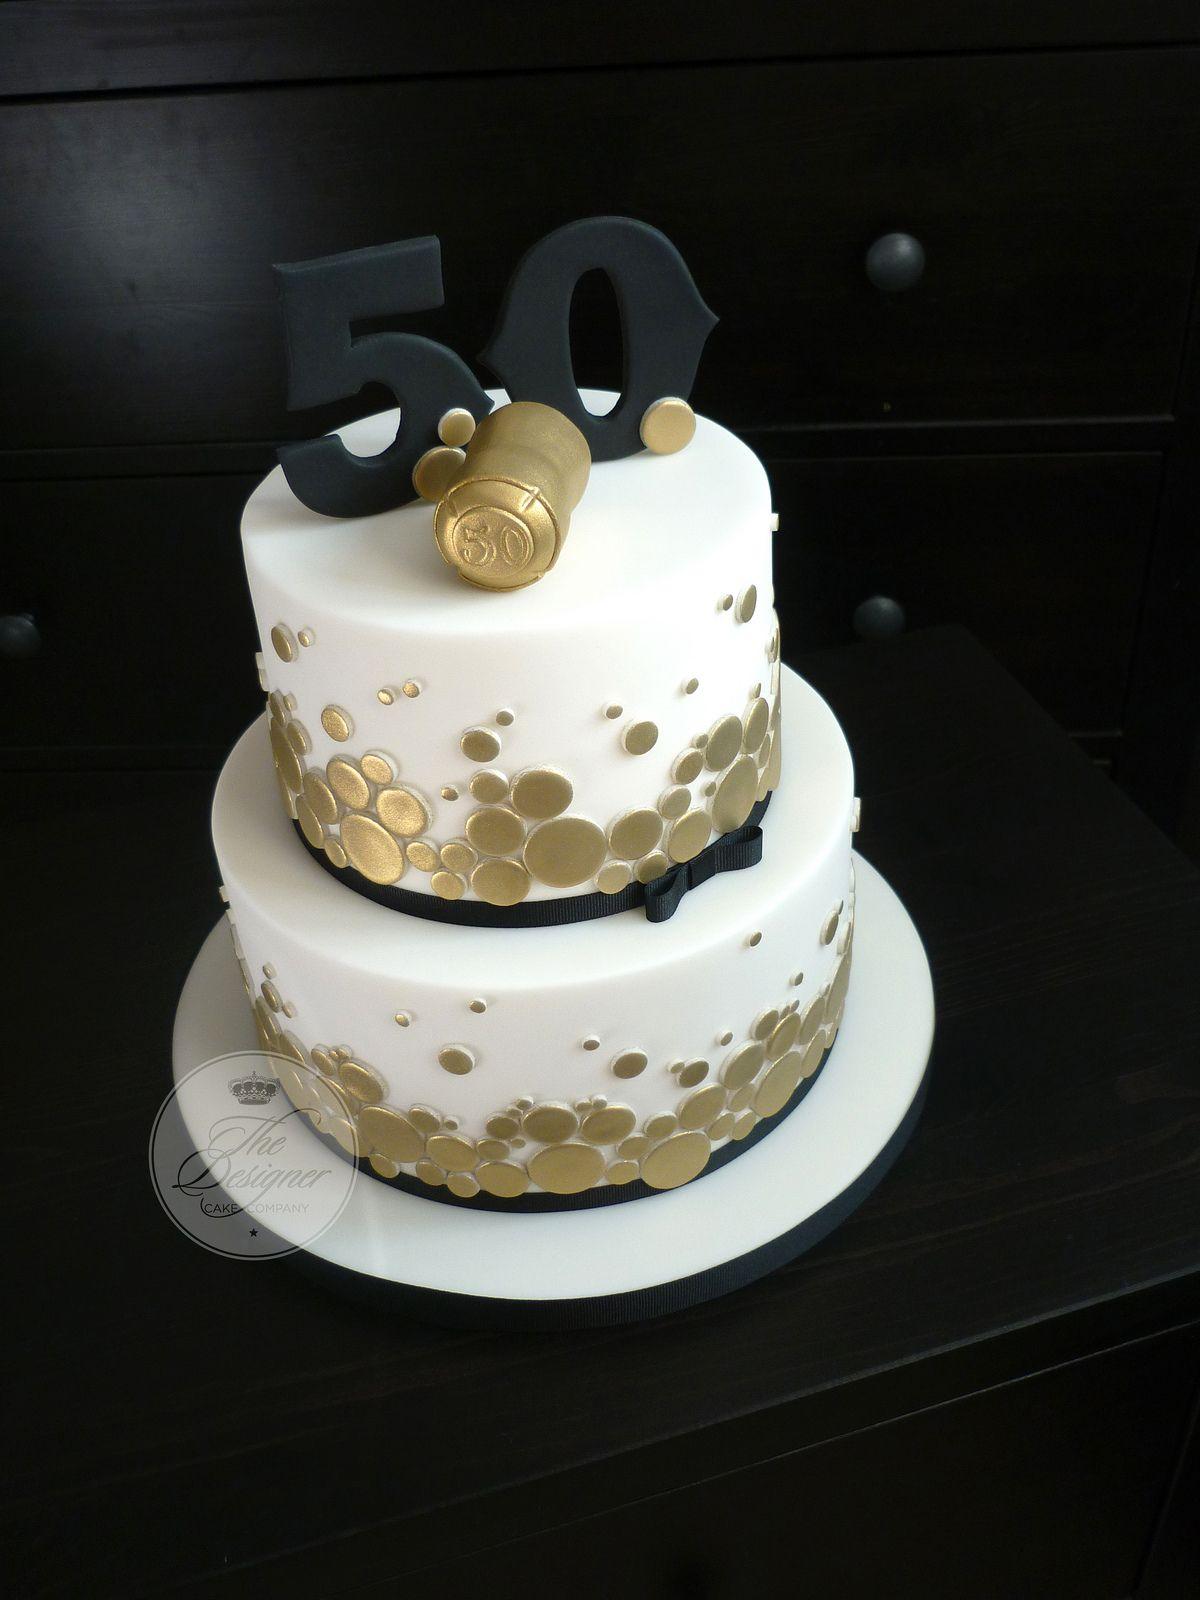 Champagne Themed 50th Birthday Cake Decoracion De Pasteles